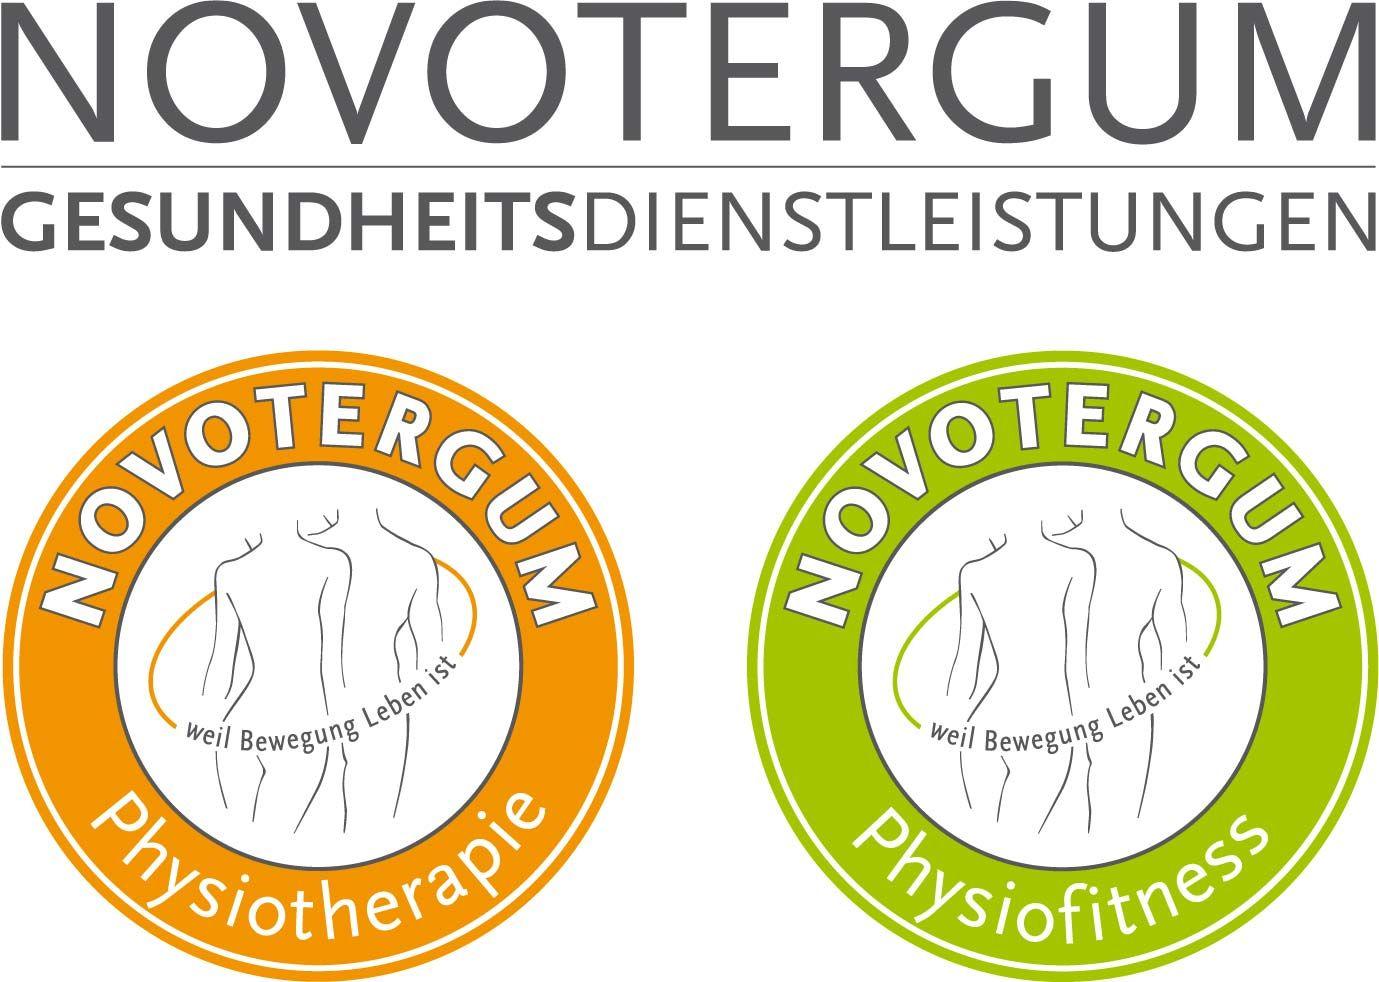 NOVOTERGUM AG